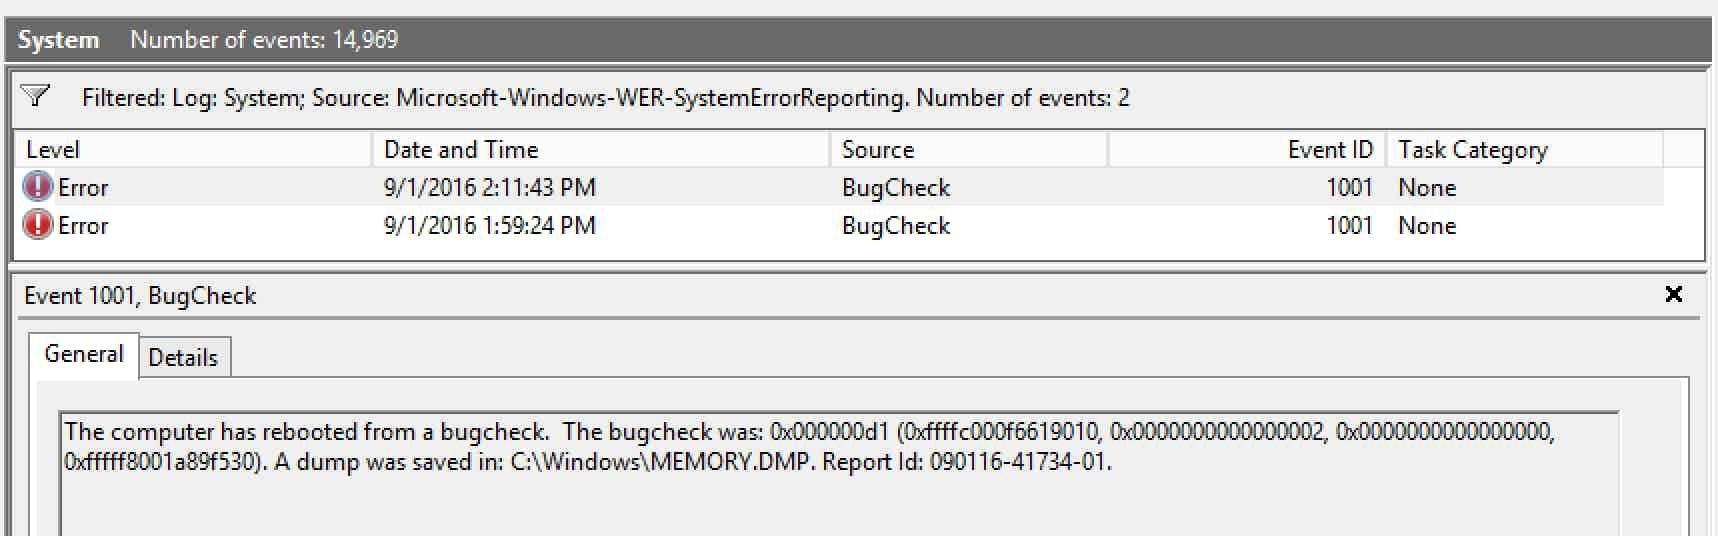 Windows Server 2012 monitoring - IRQL Less or not equal